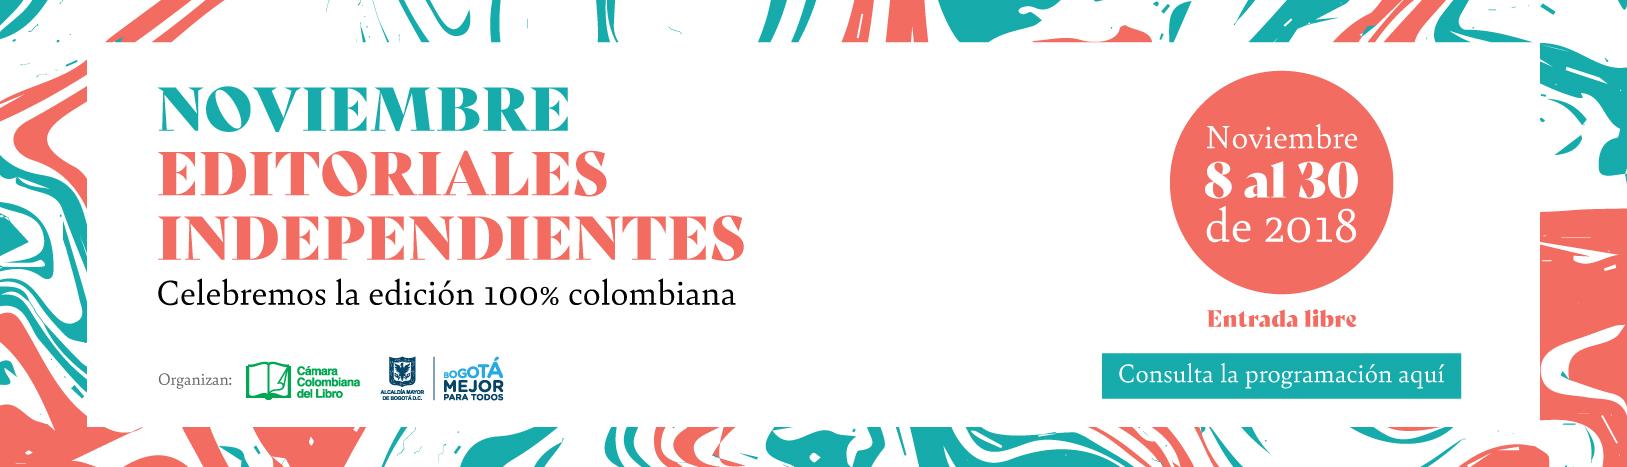 Banner-CCL-Independientes-1